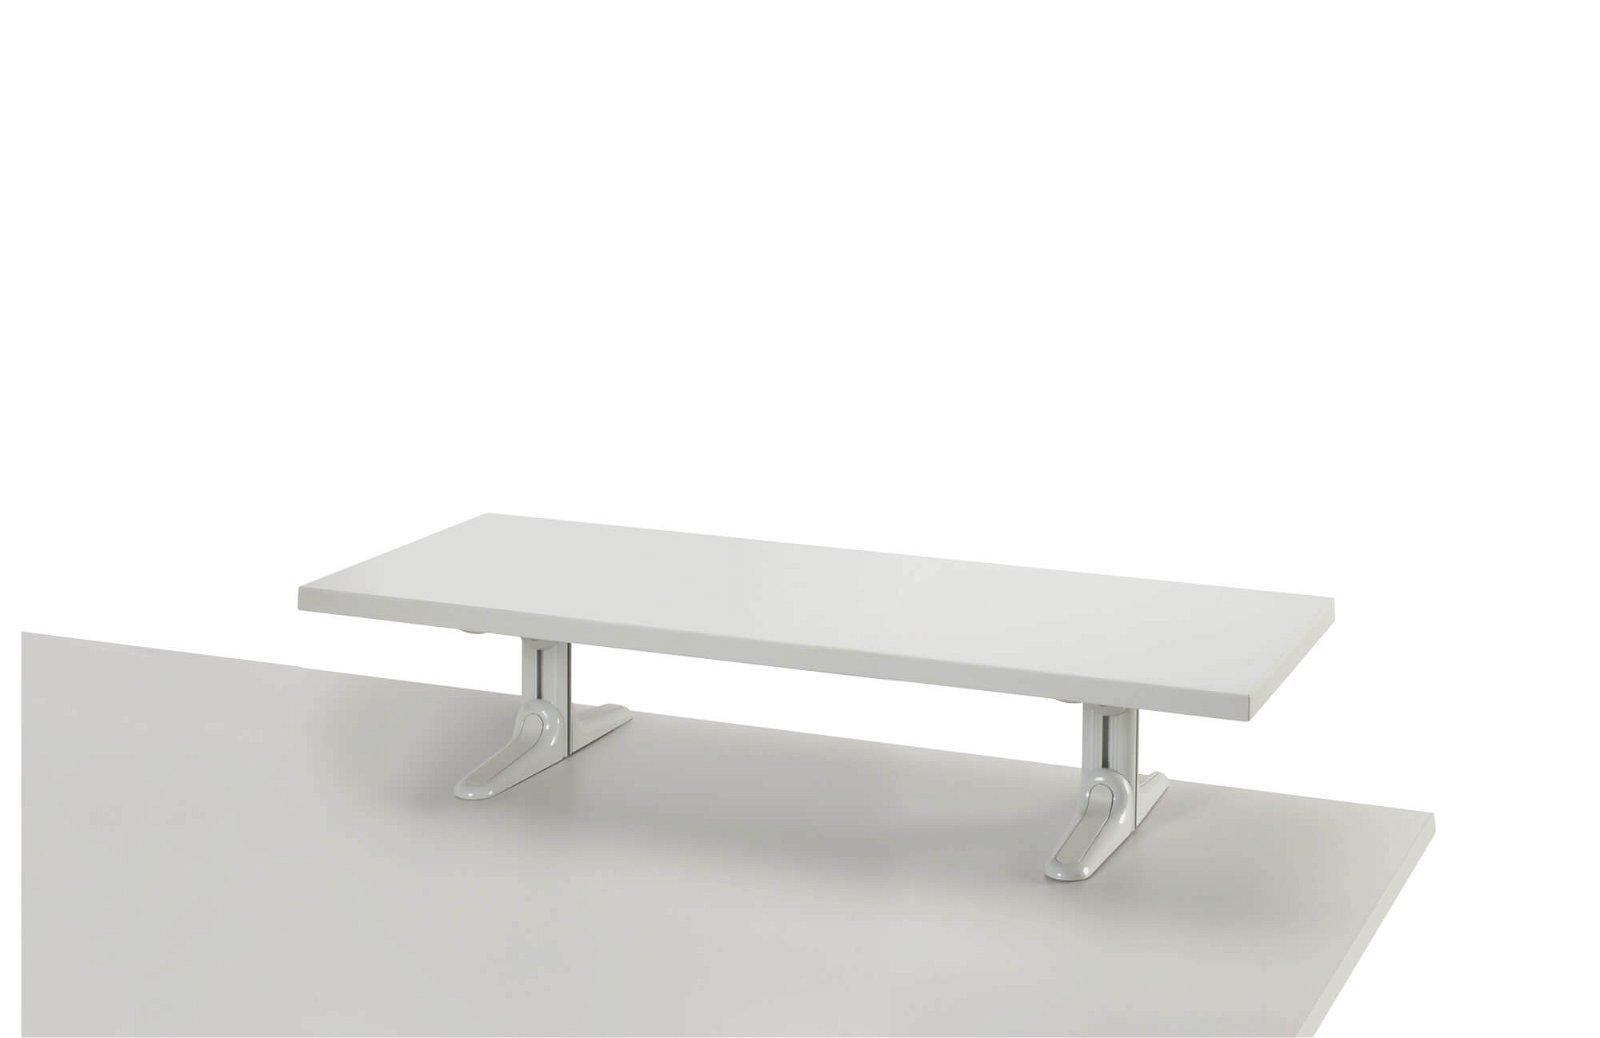 MAULboard Stehmodell, melamin- harzbeschichtet, Länge 100 cm, grau